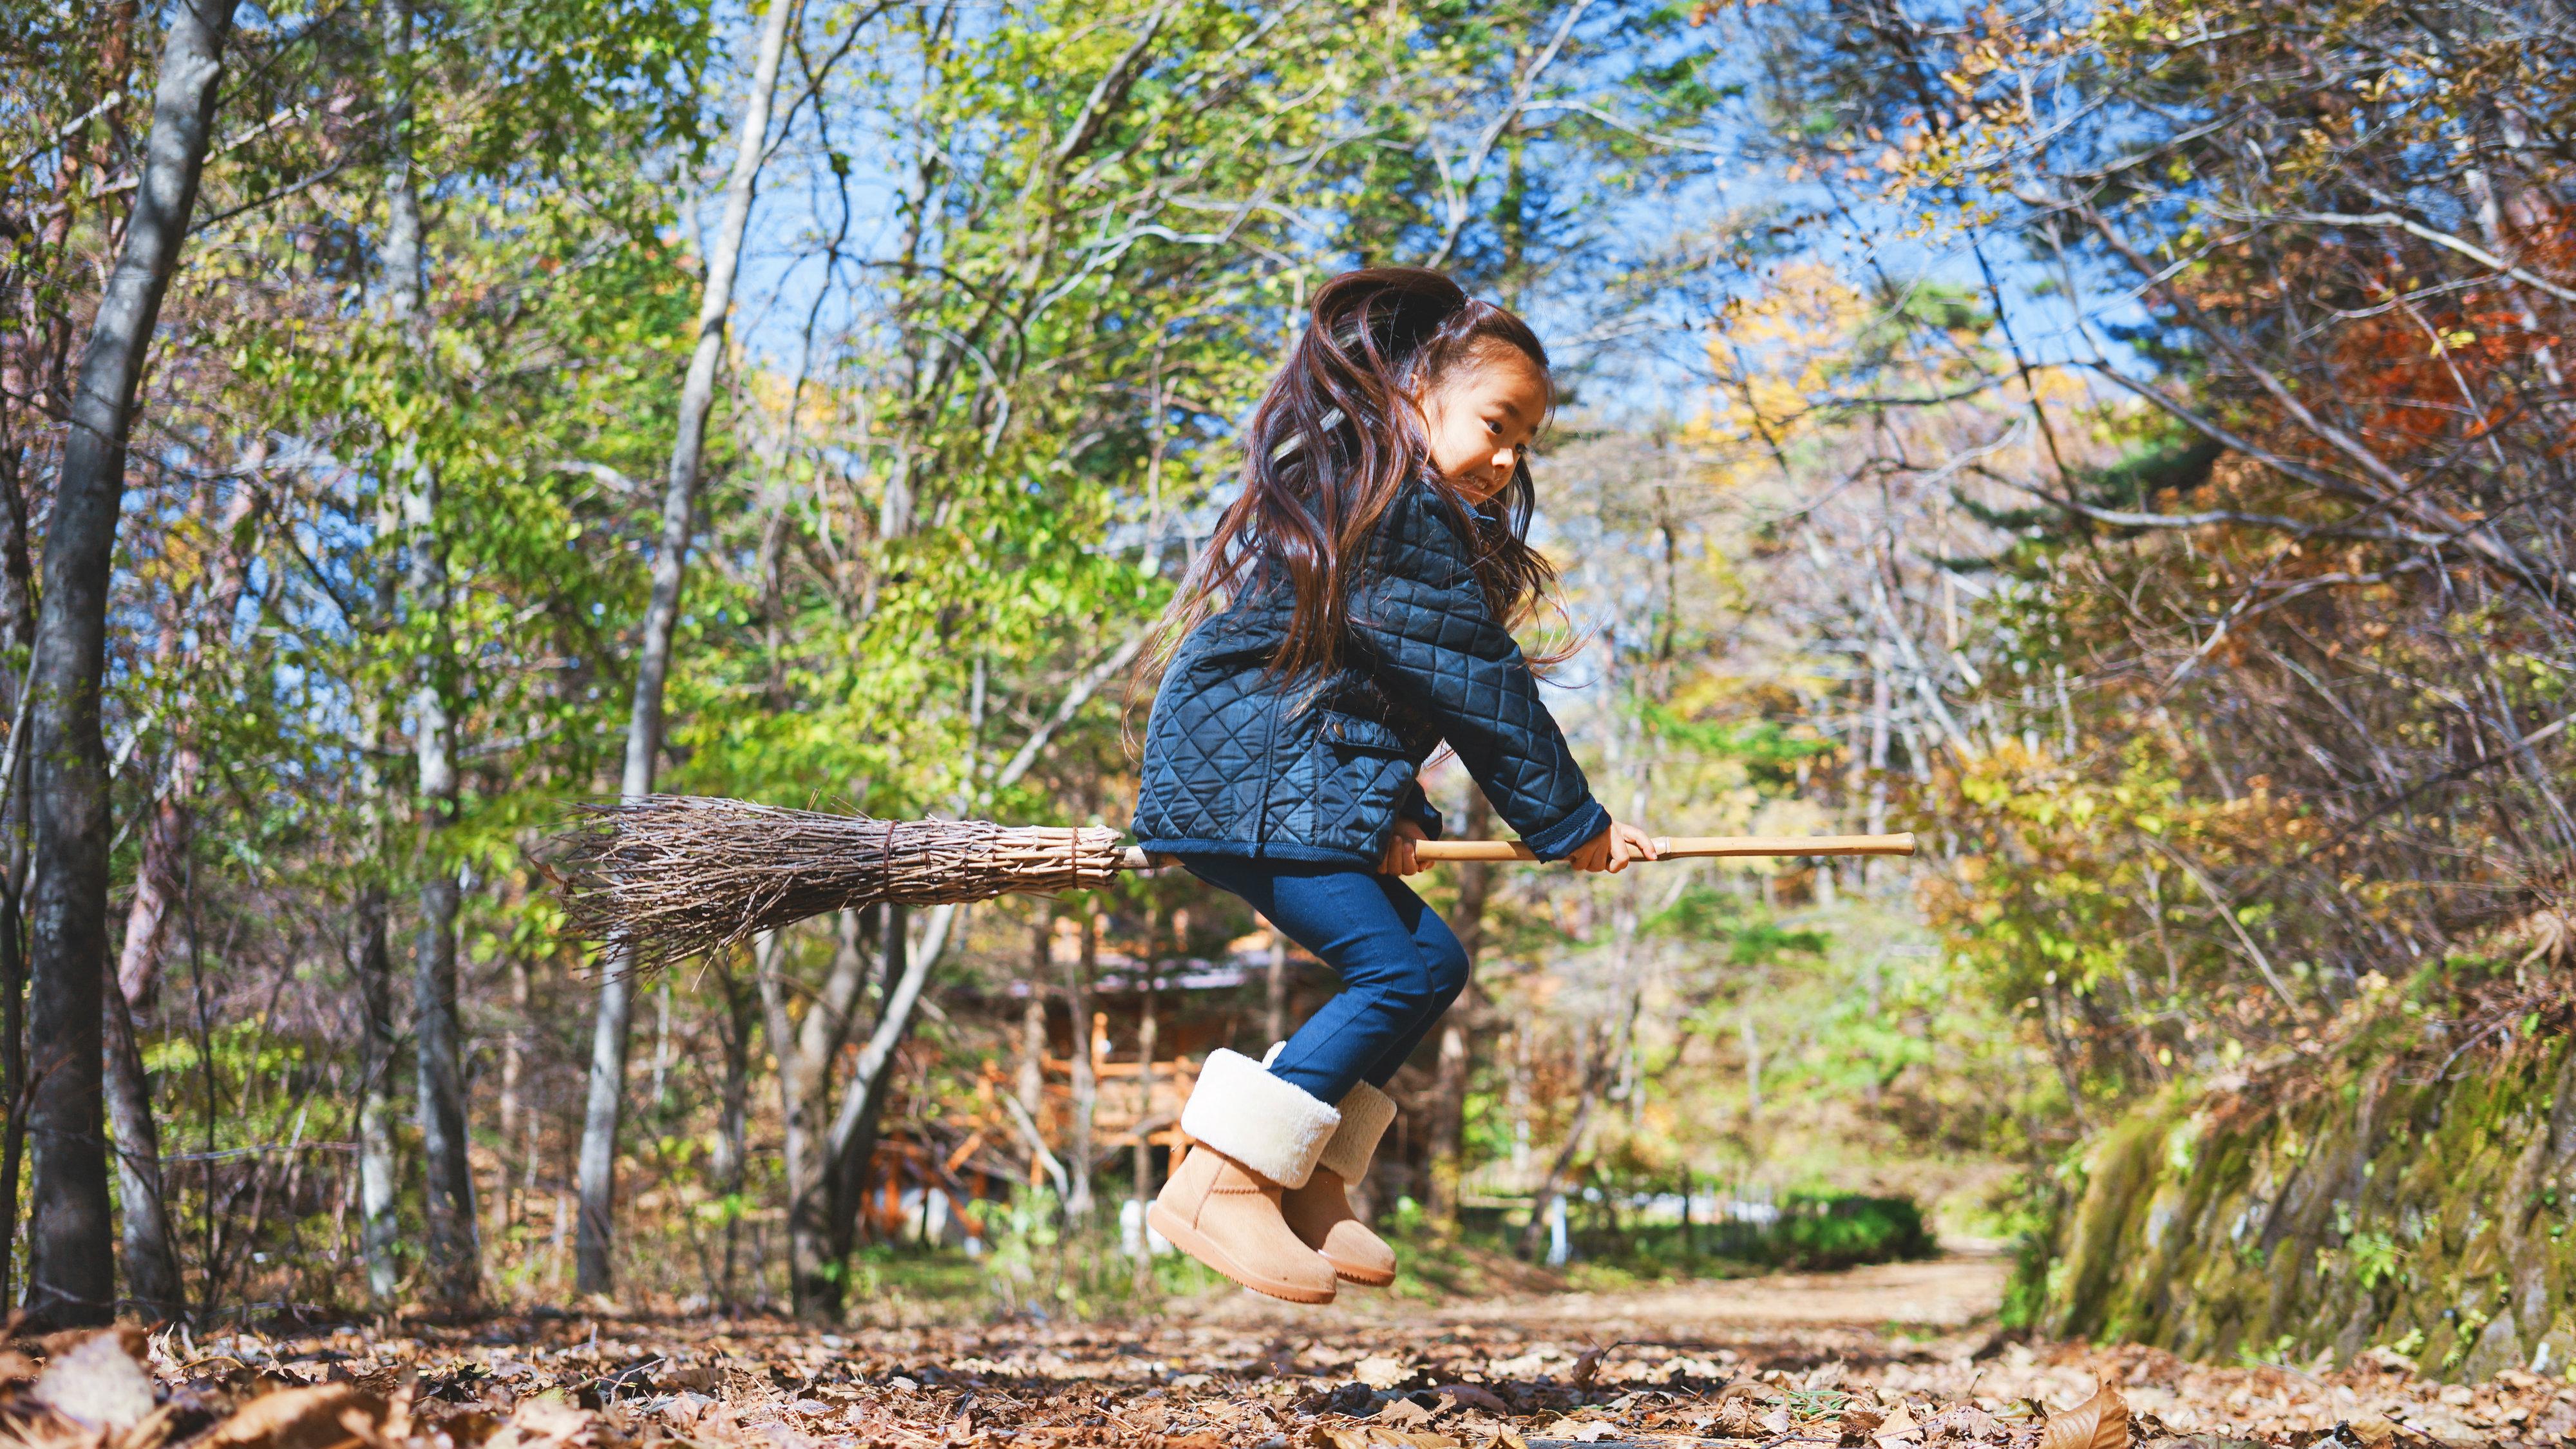 Child playing on broom.